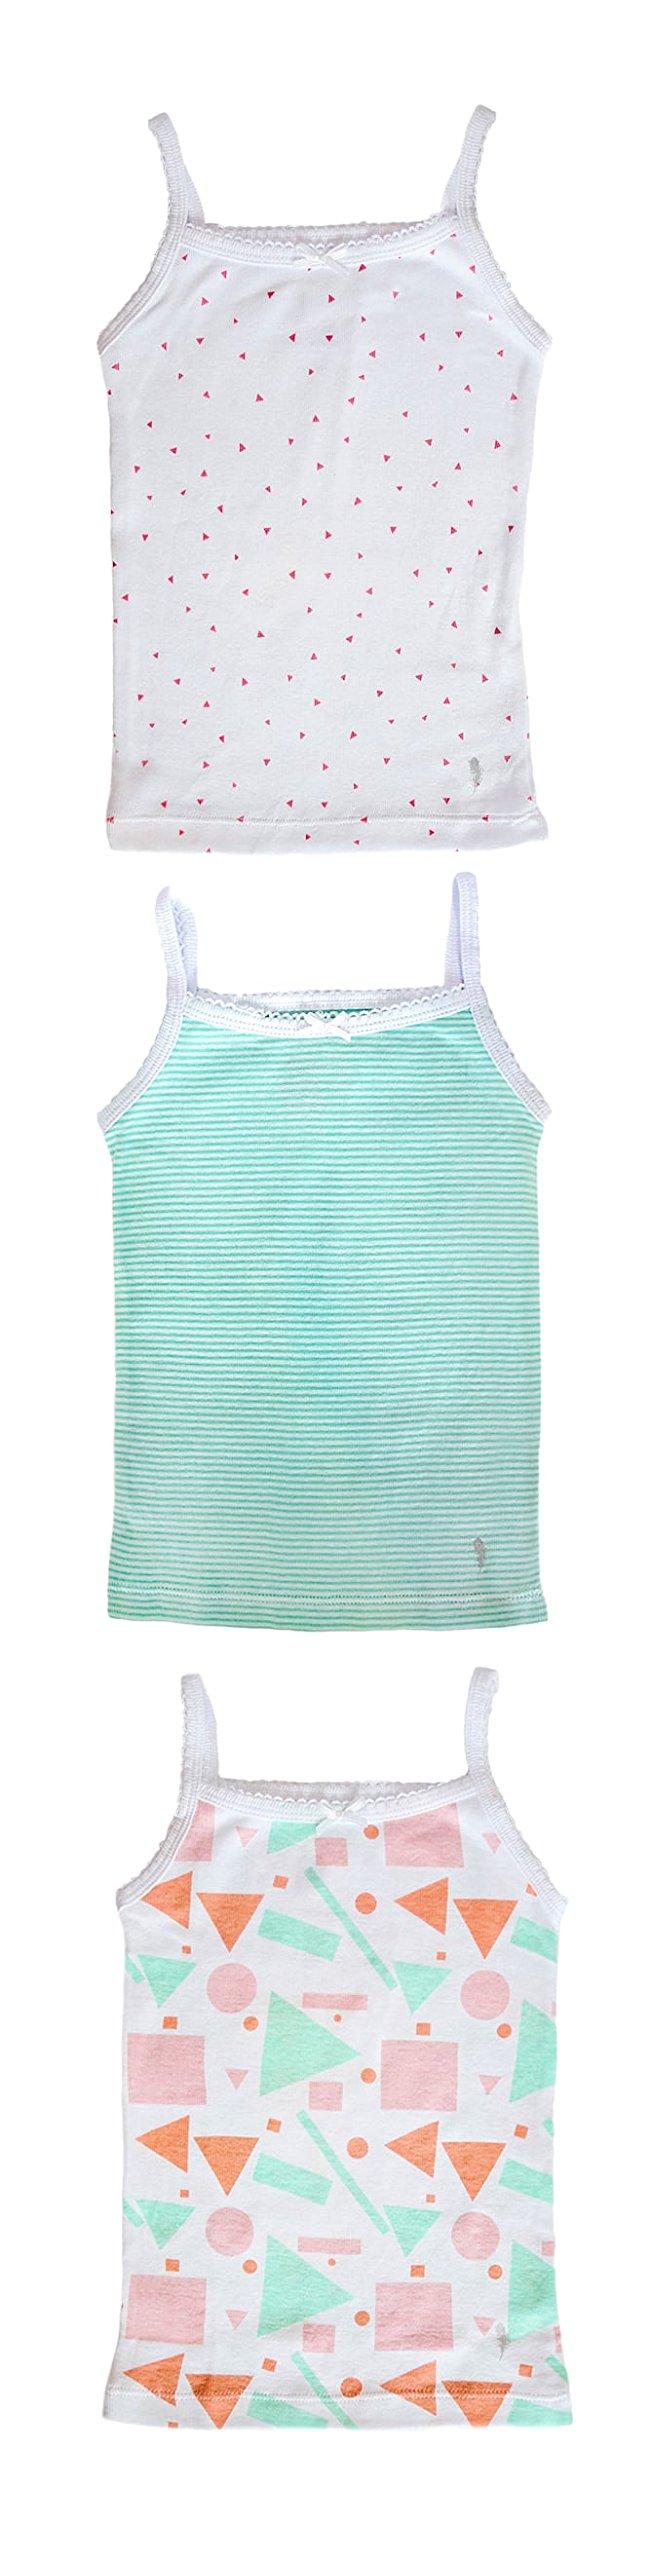 Feathers Girls Mod Print Set Tagless Cami Super Soft Undershirts (3/pack) Mod Print 6, Mod Print, 6